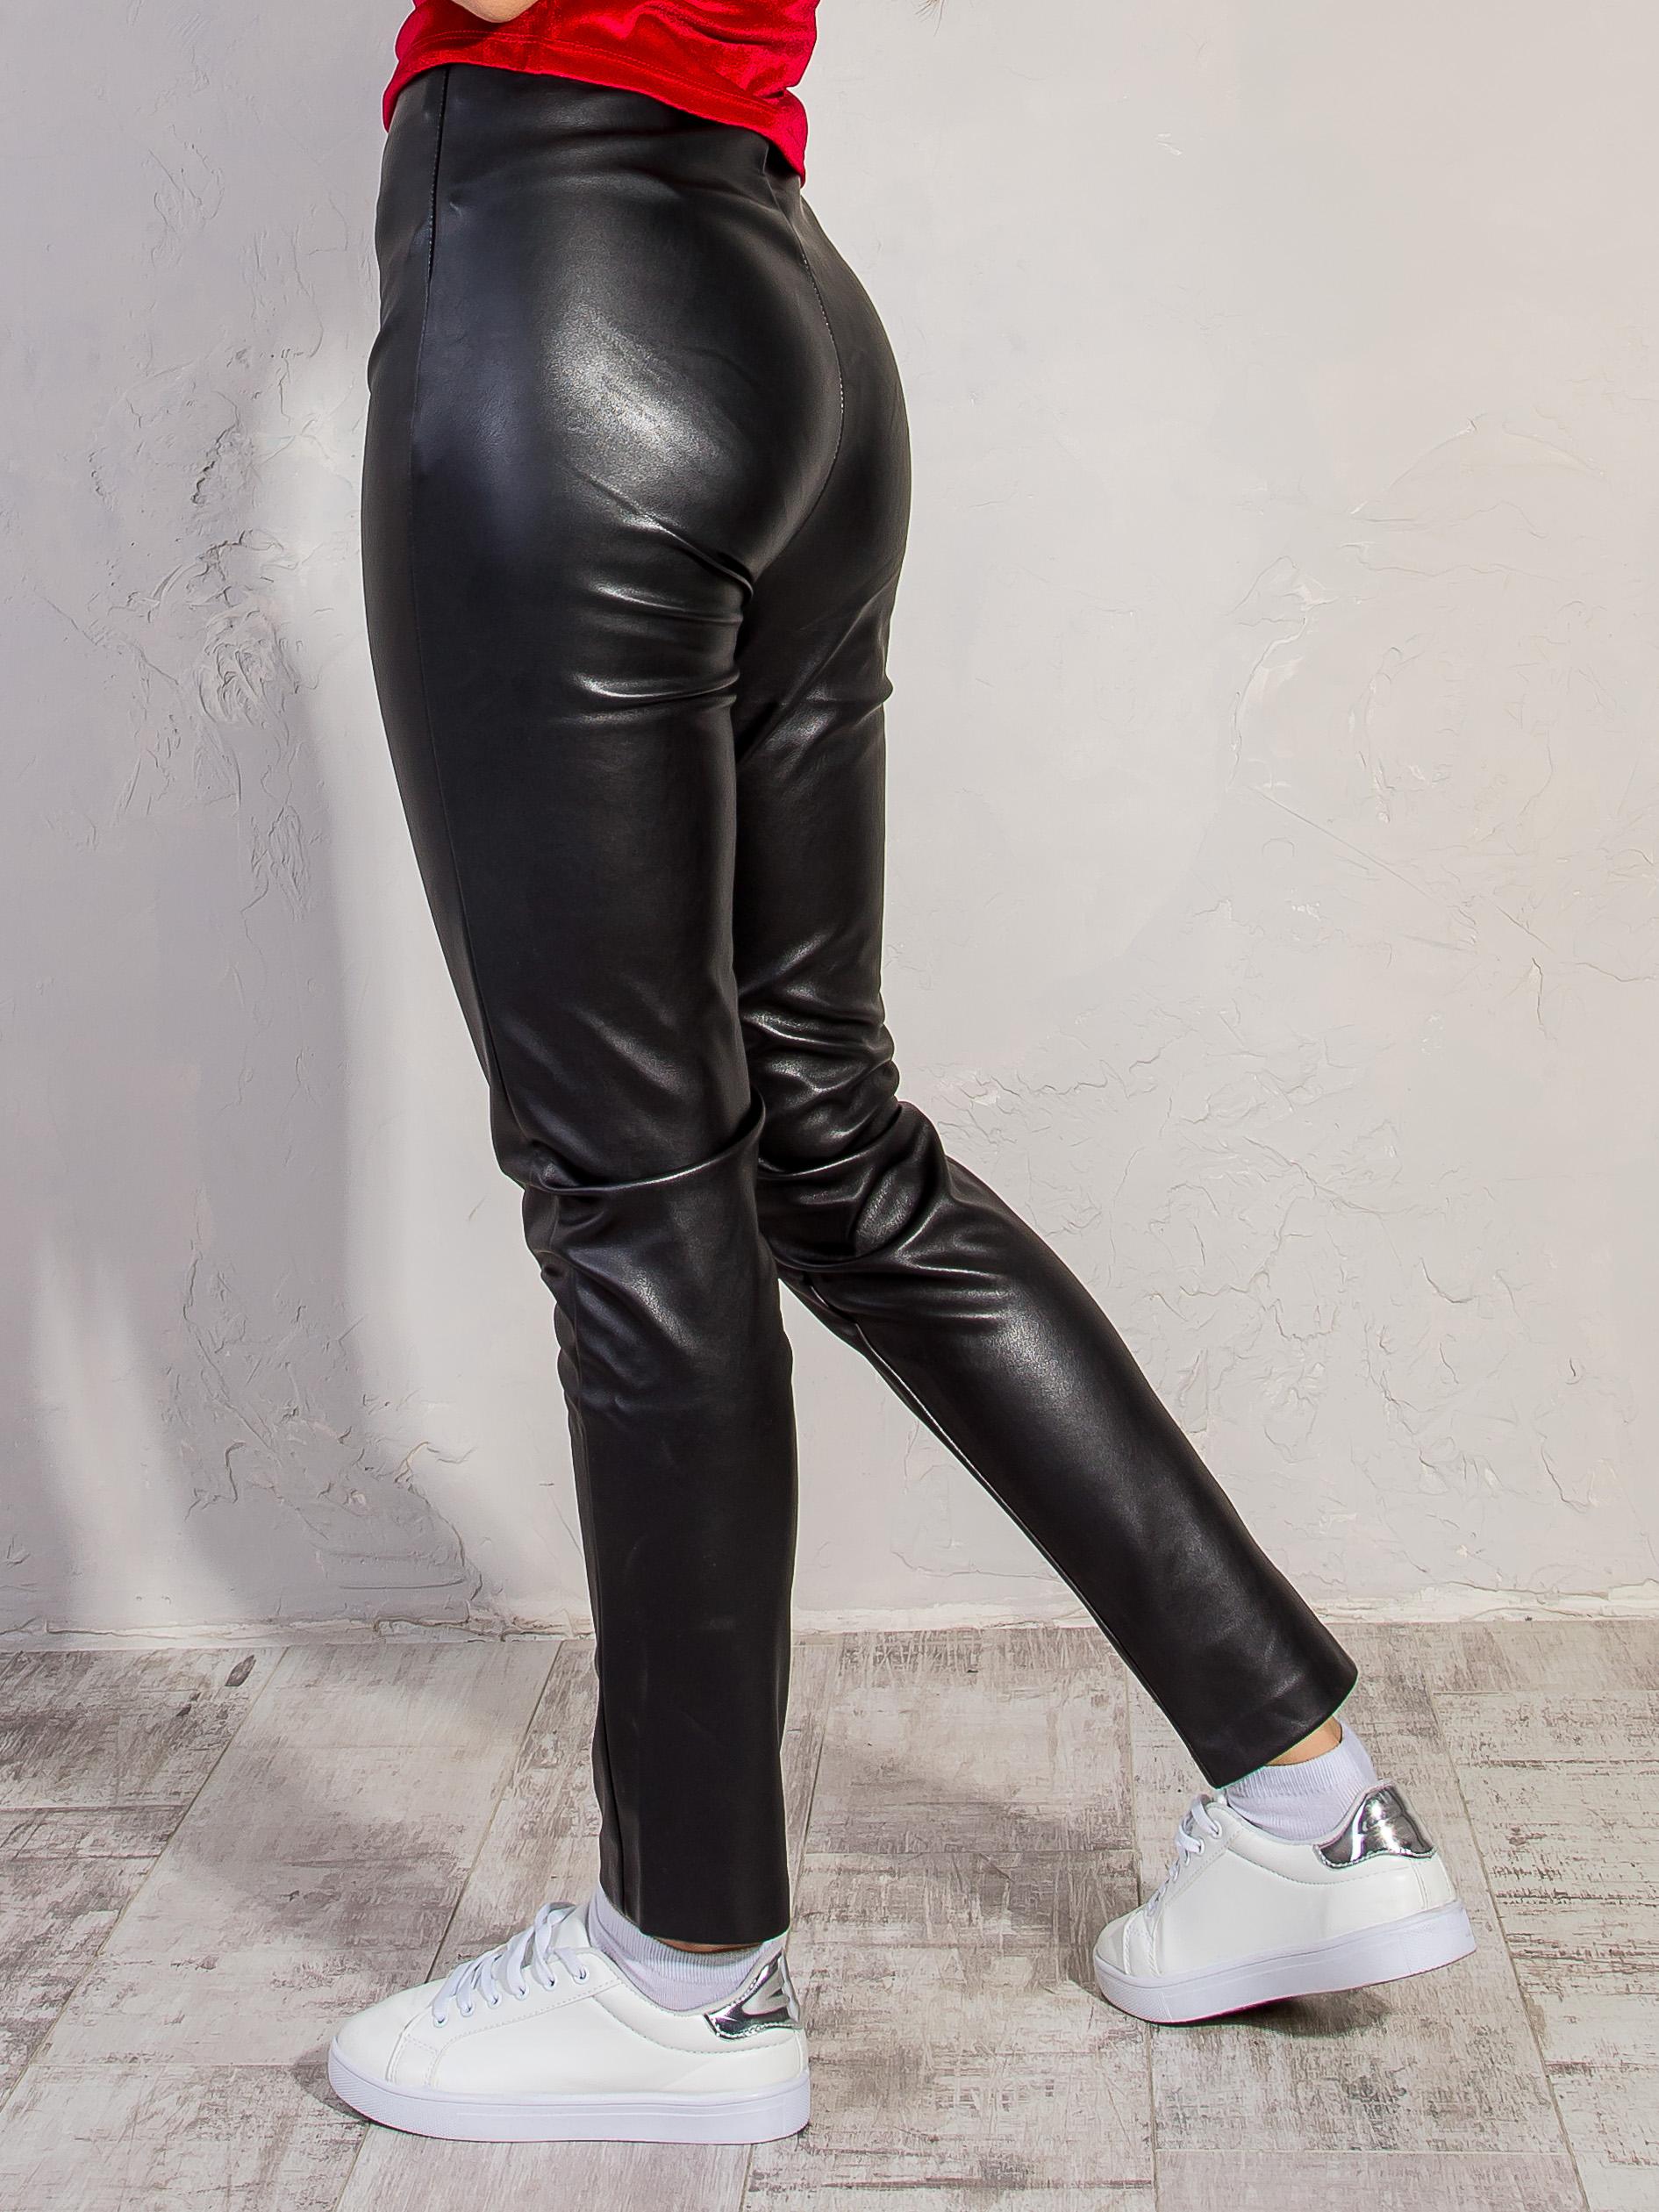 Брюки из эко-кожи BEBE PLUS 20585 Черный Free Style